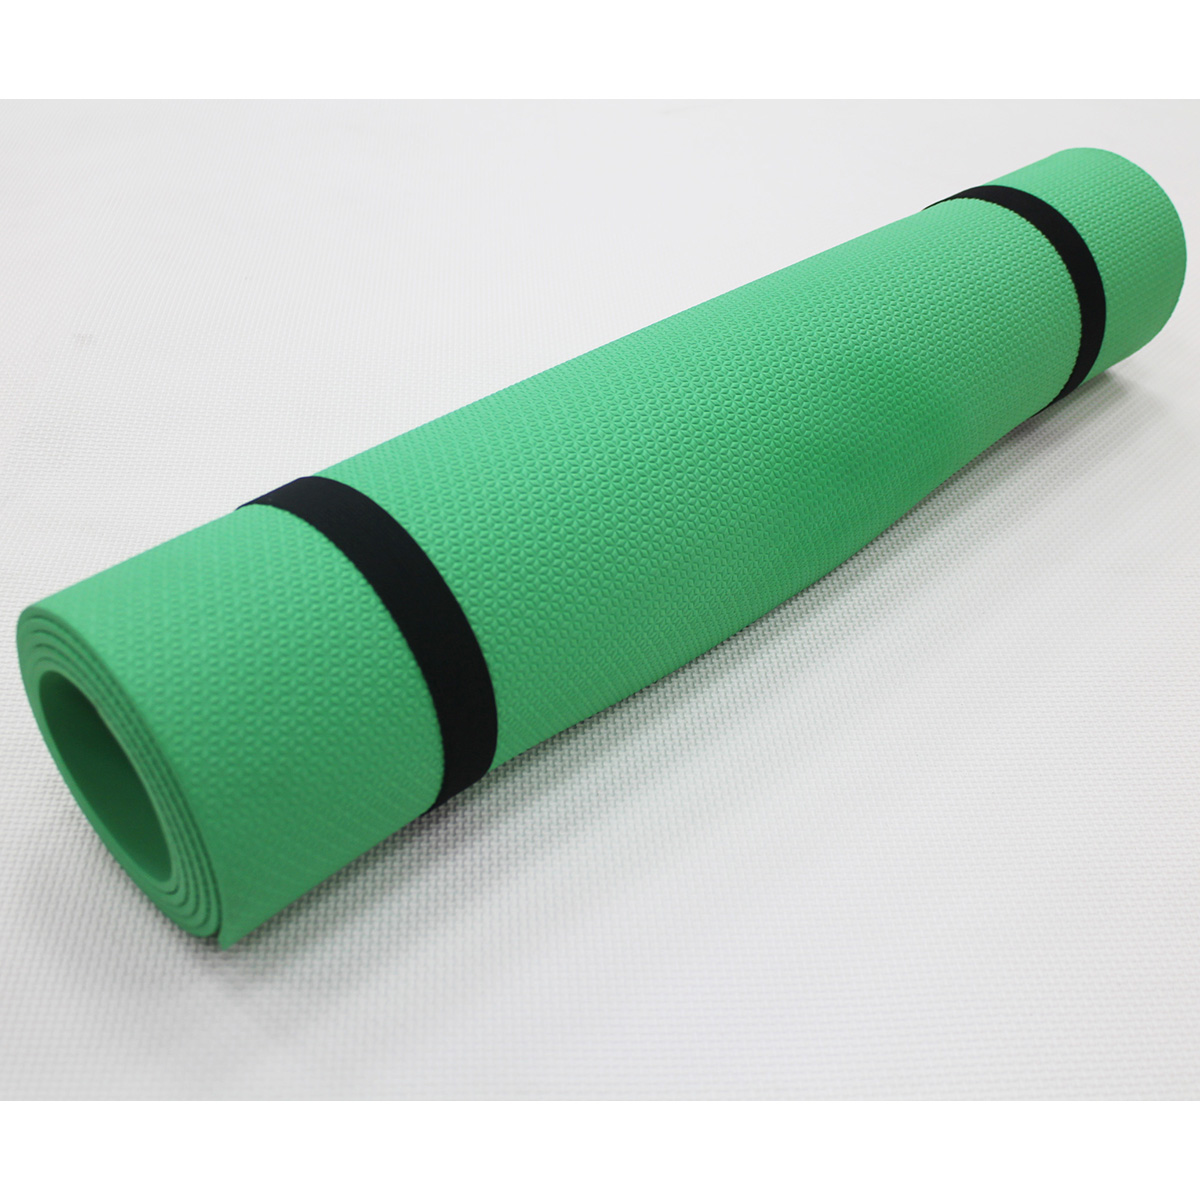 4Fighter Gymnastik Yogamatte, Pilatesmatte, Fitnessmatte mit Gummiband180 x 60 x 0,4cm grün